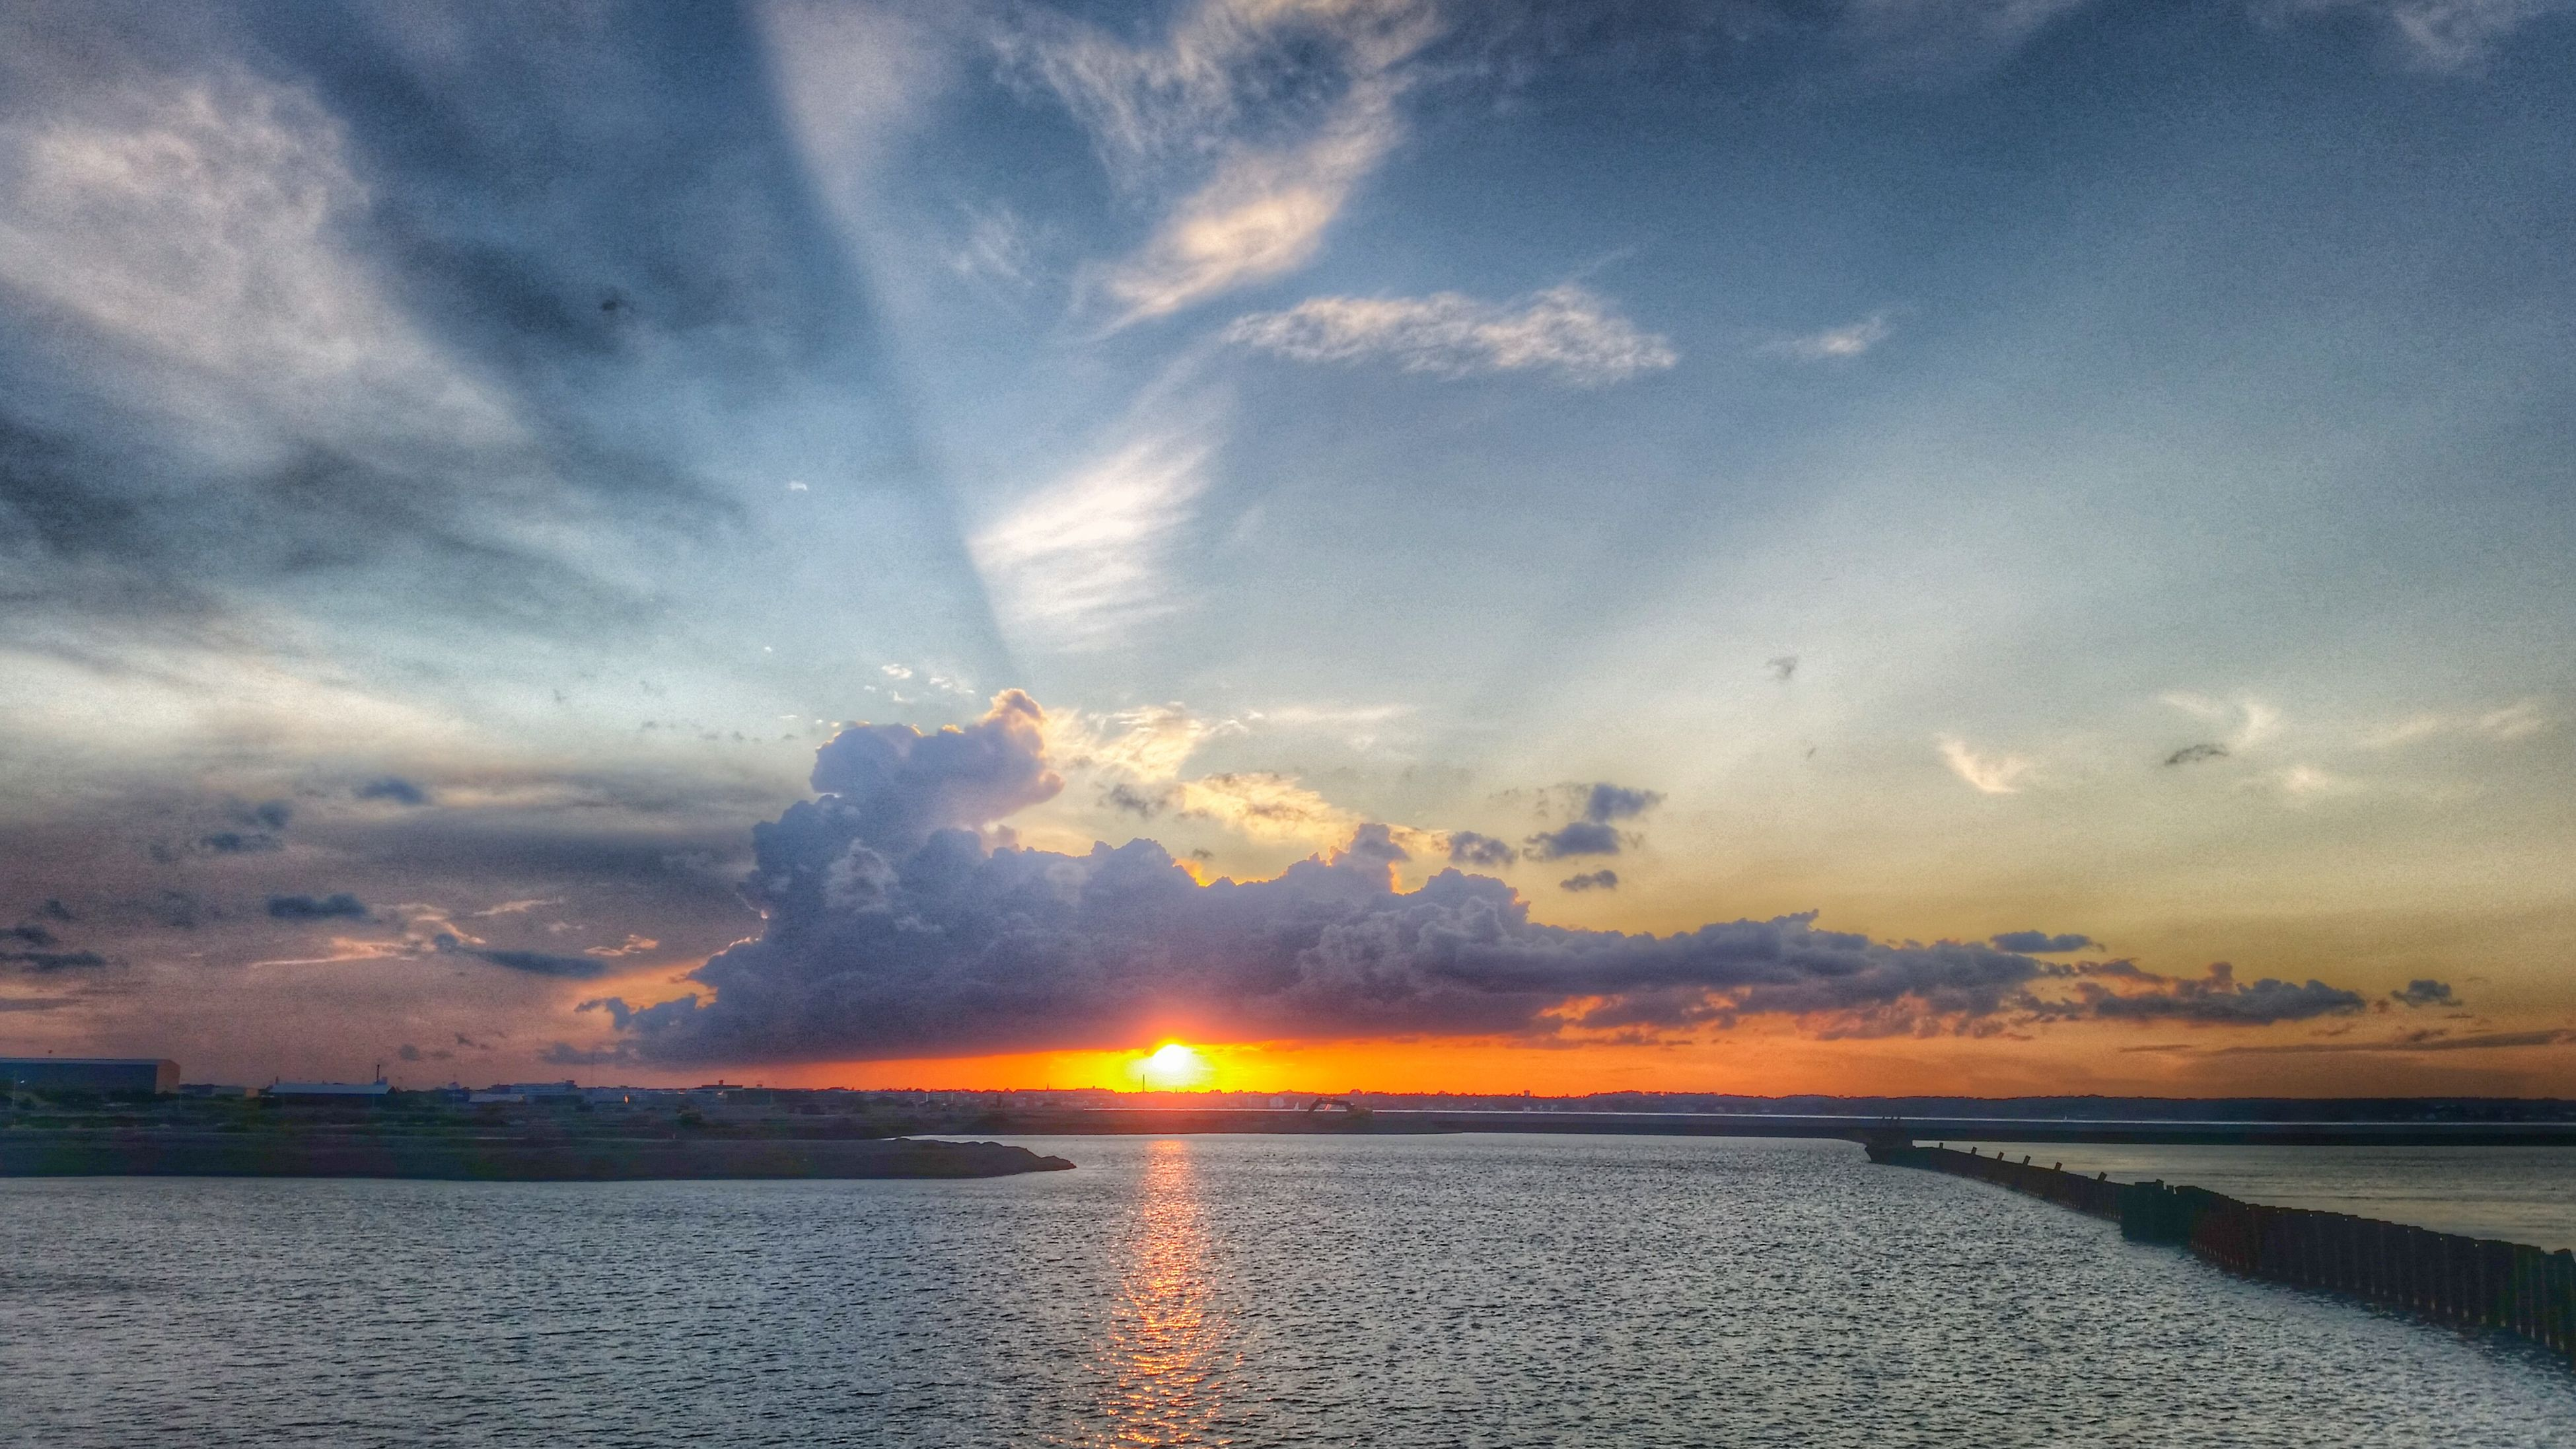 sunset, water, sky, sea, scenics, cloud - sky, beauty in nature, tranquil scene, sun, tranquility, horizon over water, reflection, orange color, nature, idyllic, cloud, sunbeam, sunlight, cloudy, beach